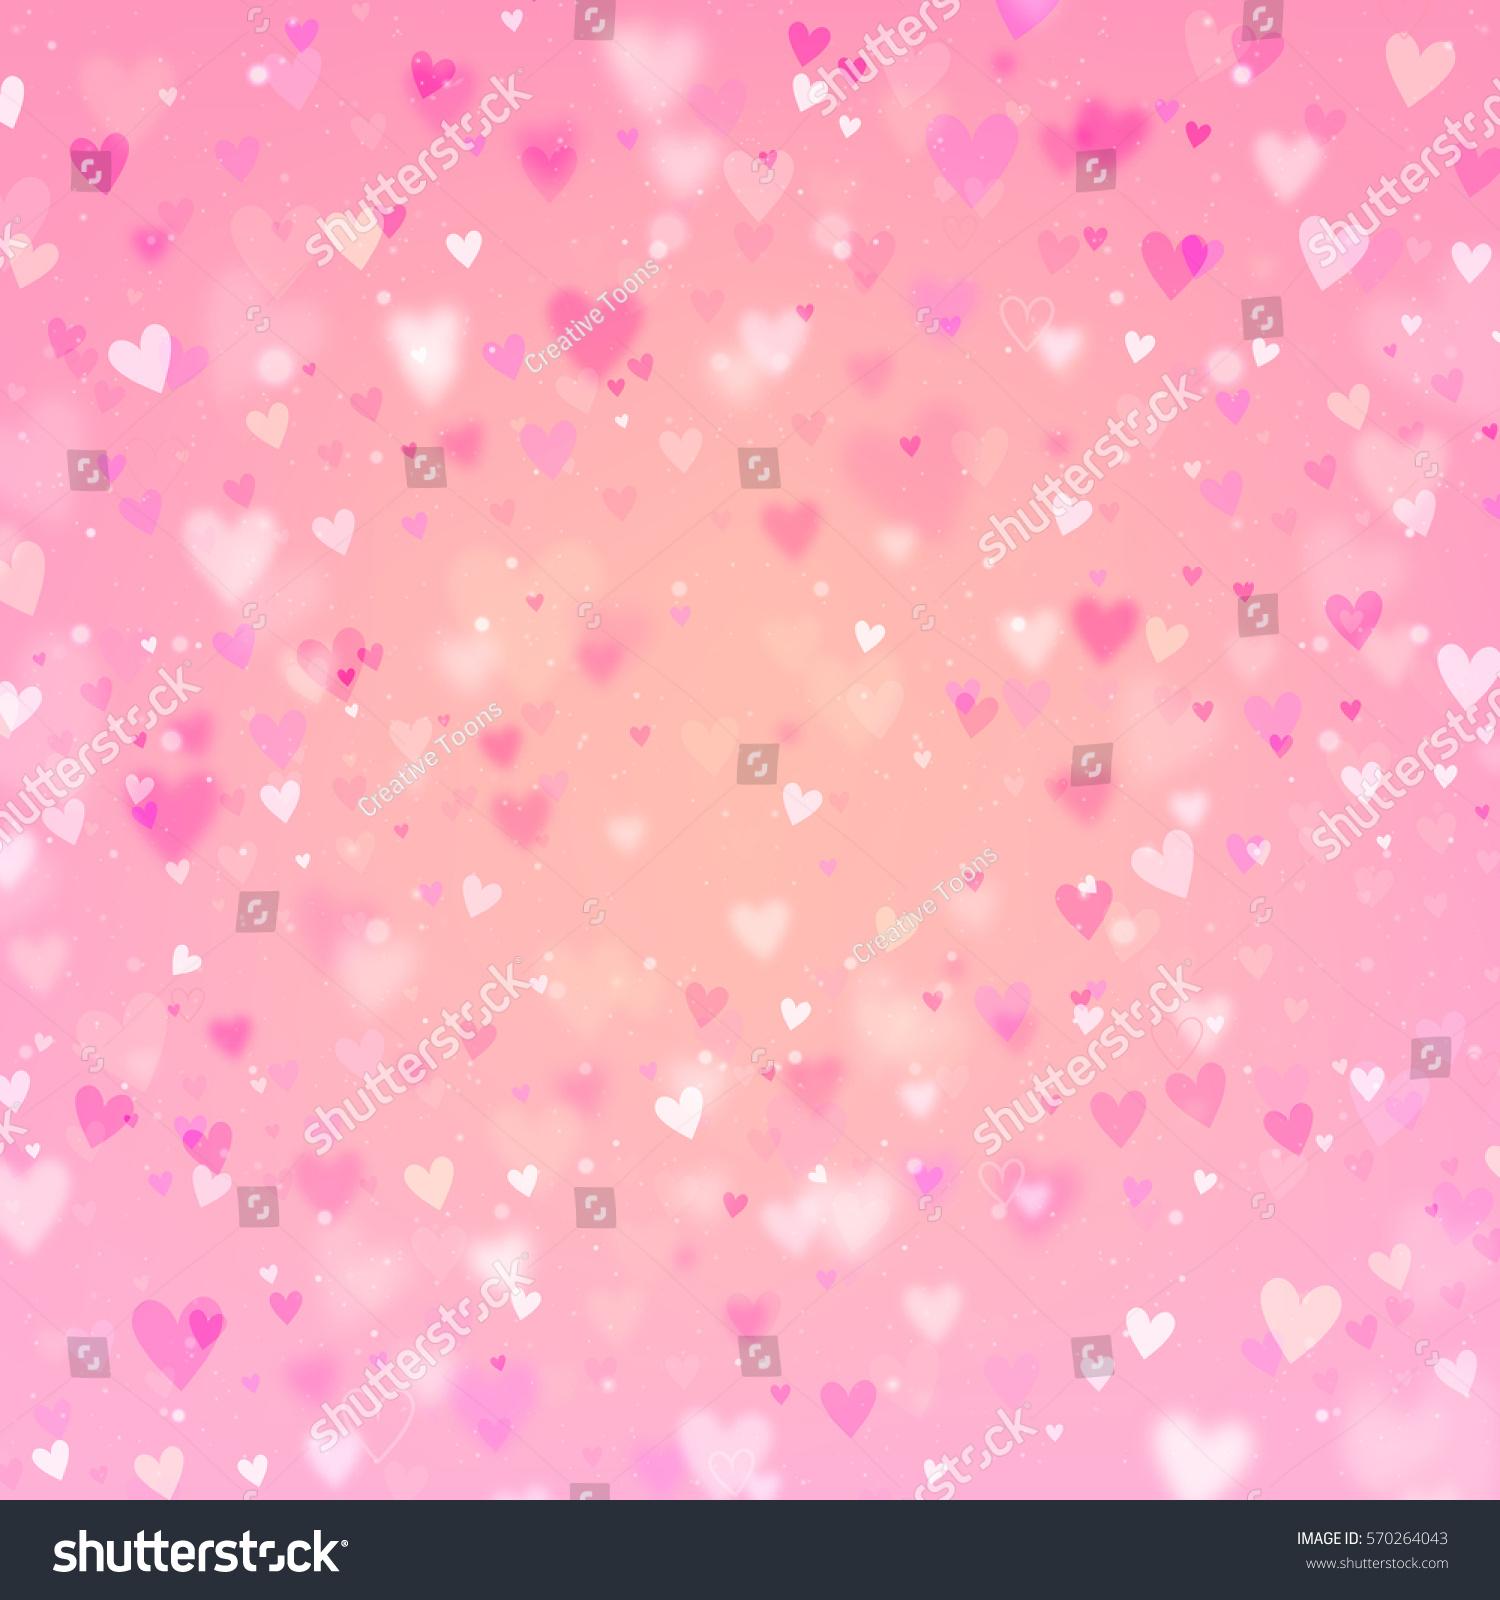 Pink Valentines Day Background Valentines Day Stock Illustration